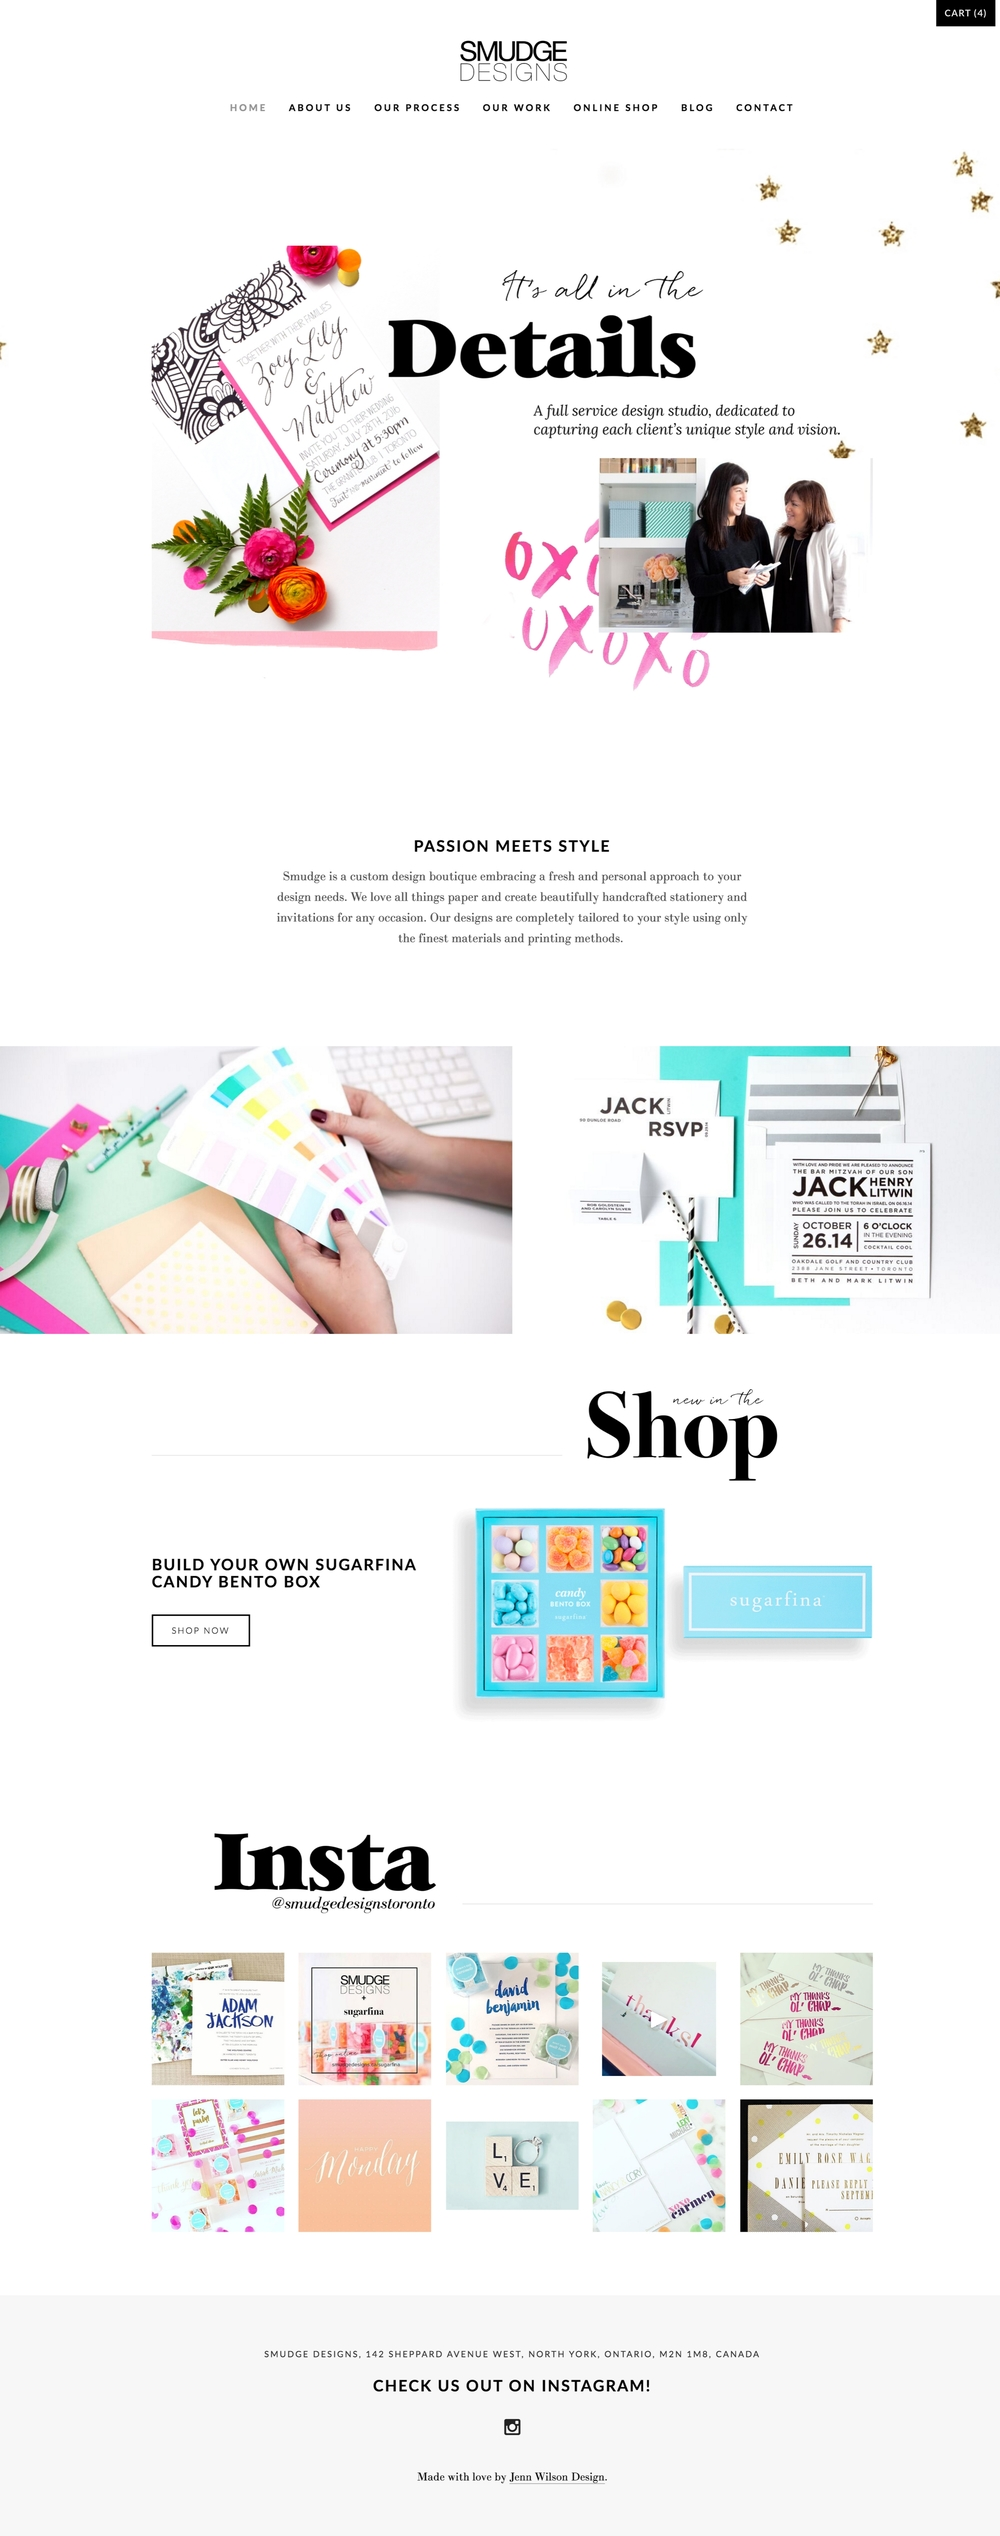 Smudge+Designs+website+-+inspiration++-++by+jennwilsondesign.jpg